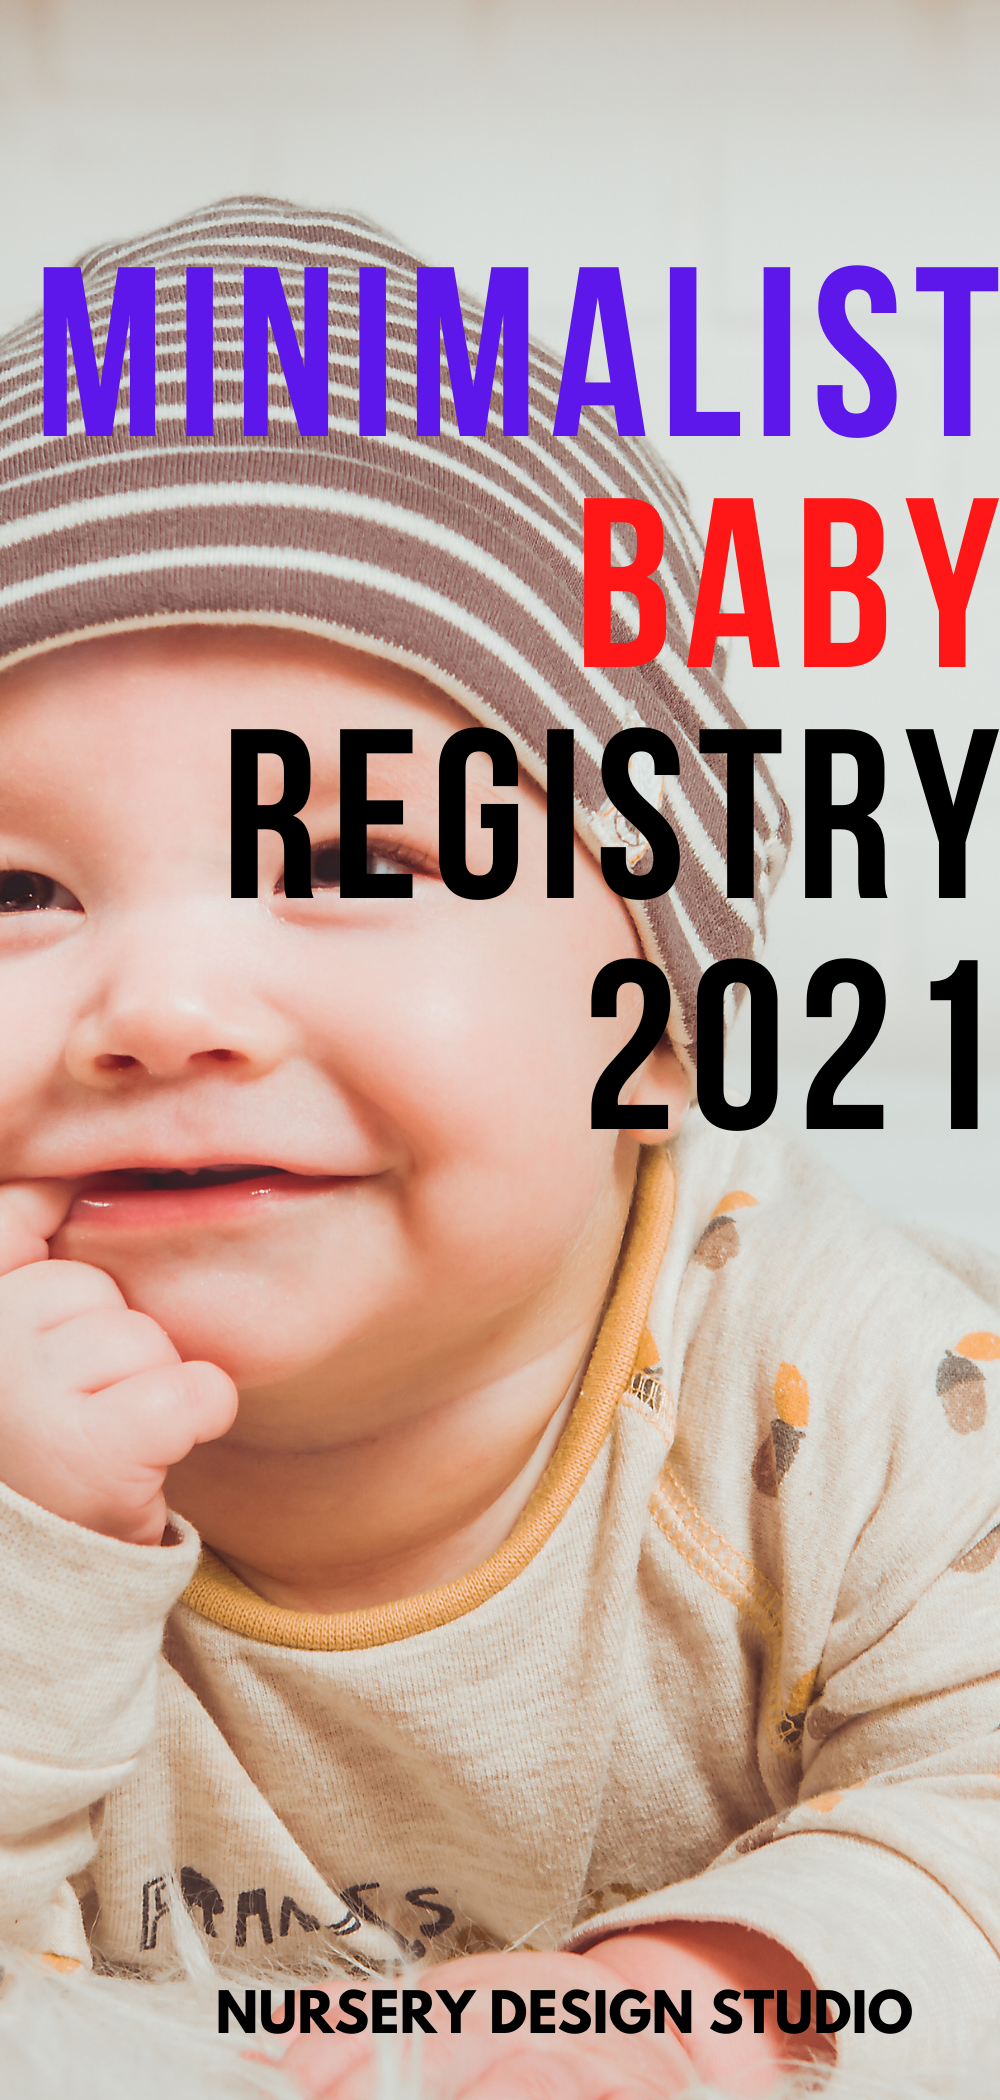 MINIMALIST BABY REGISTRY